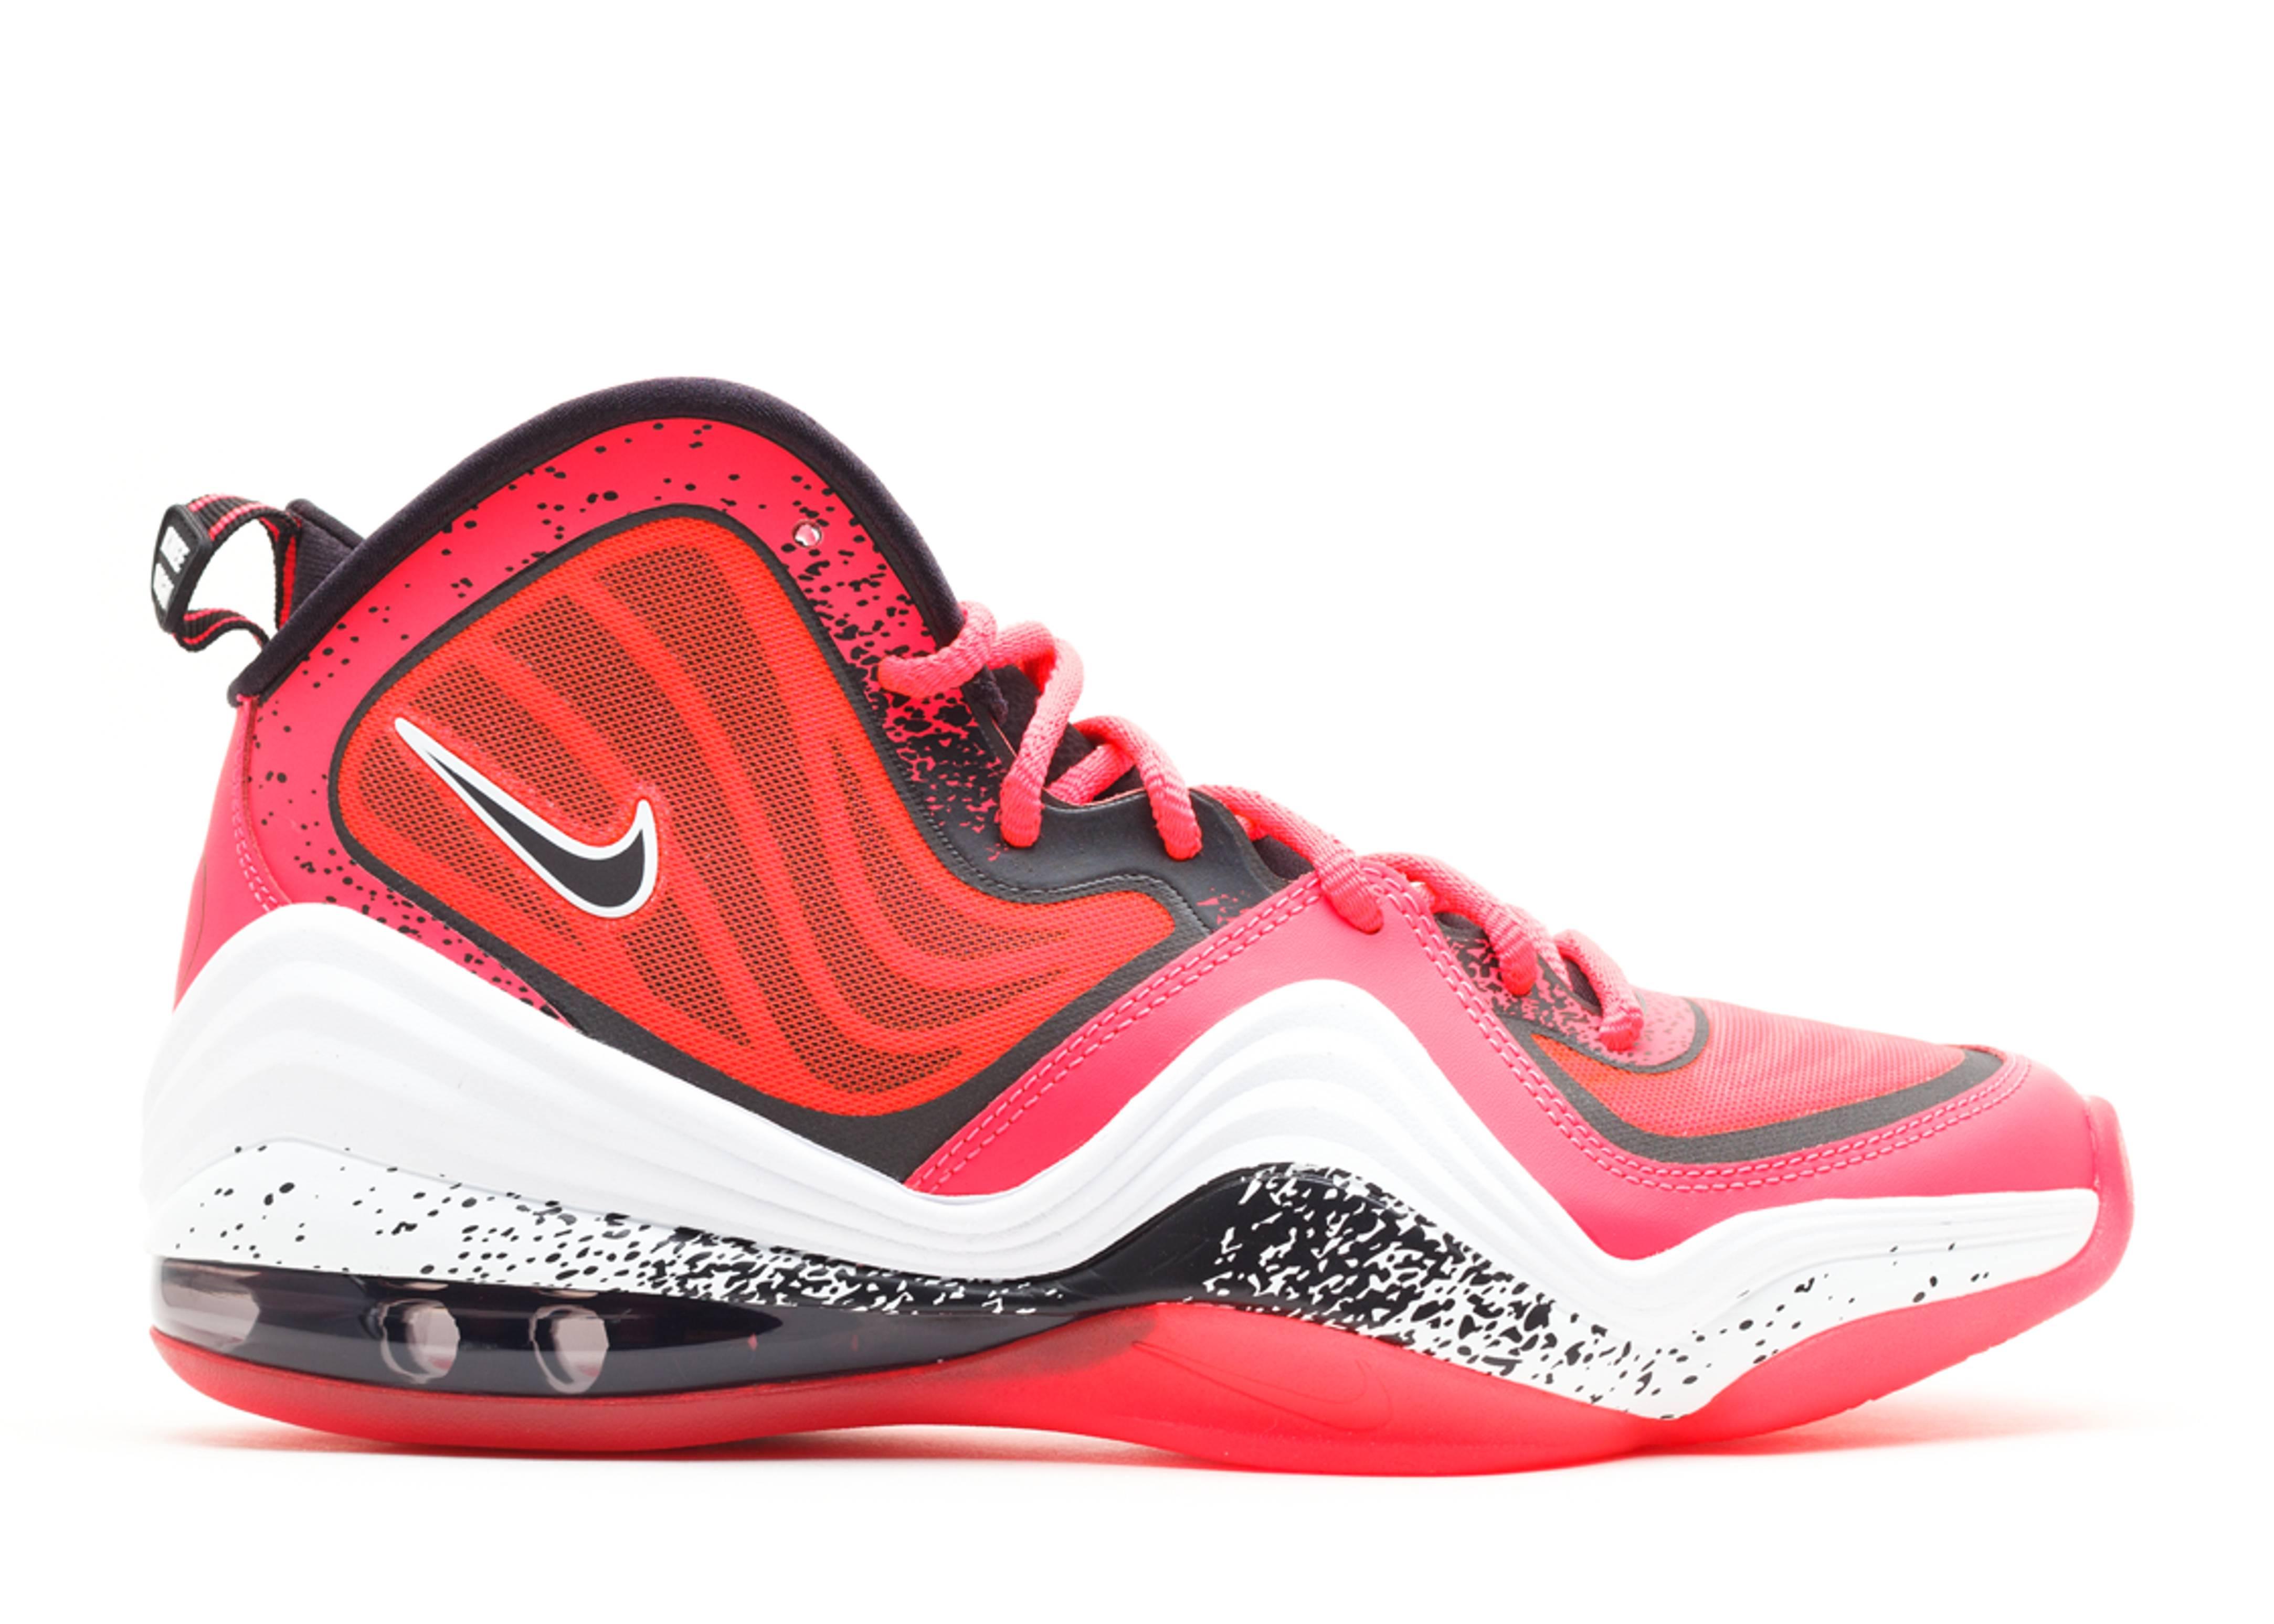 brand new a12c5 d4e79 Air Penny 5 Lil - Nike - 628570 601 - atomic red black-white   Flight Club